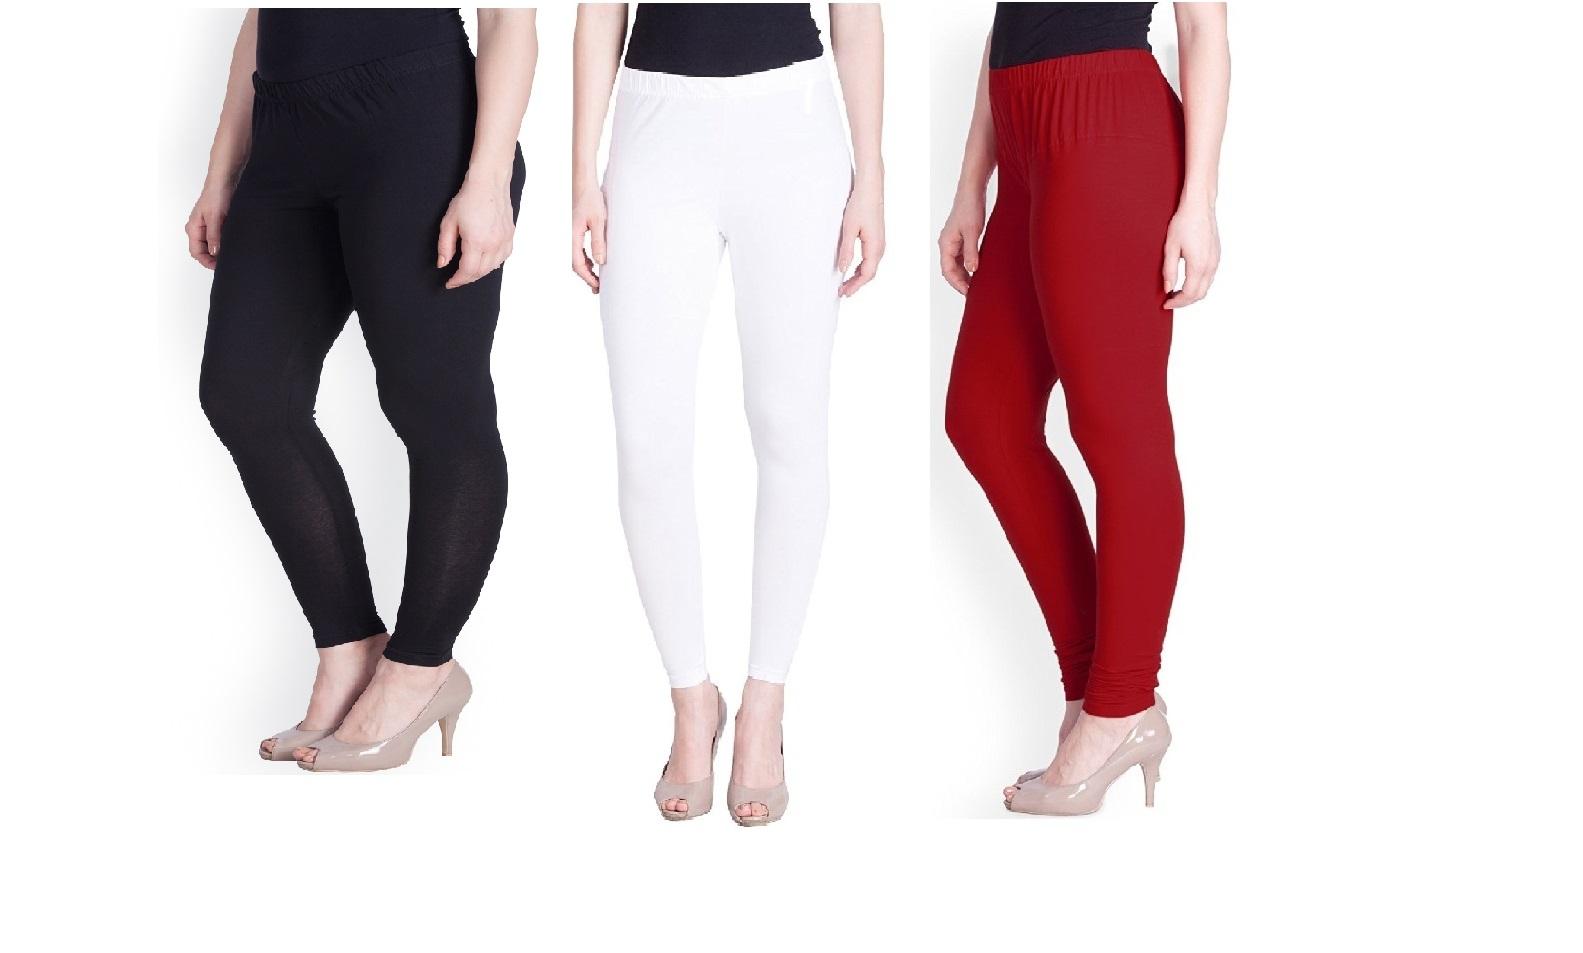 Kaym Multicolor   White,Red,Black  Cotton Leggings for Women Combo Pack of 3